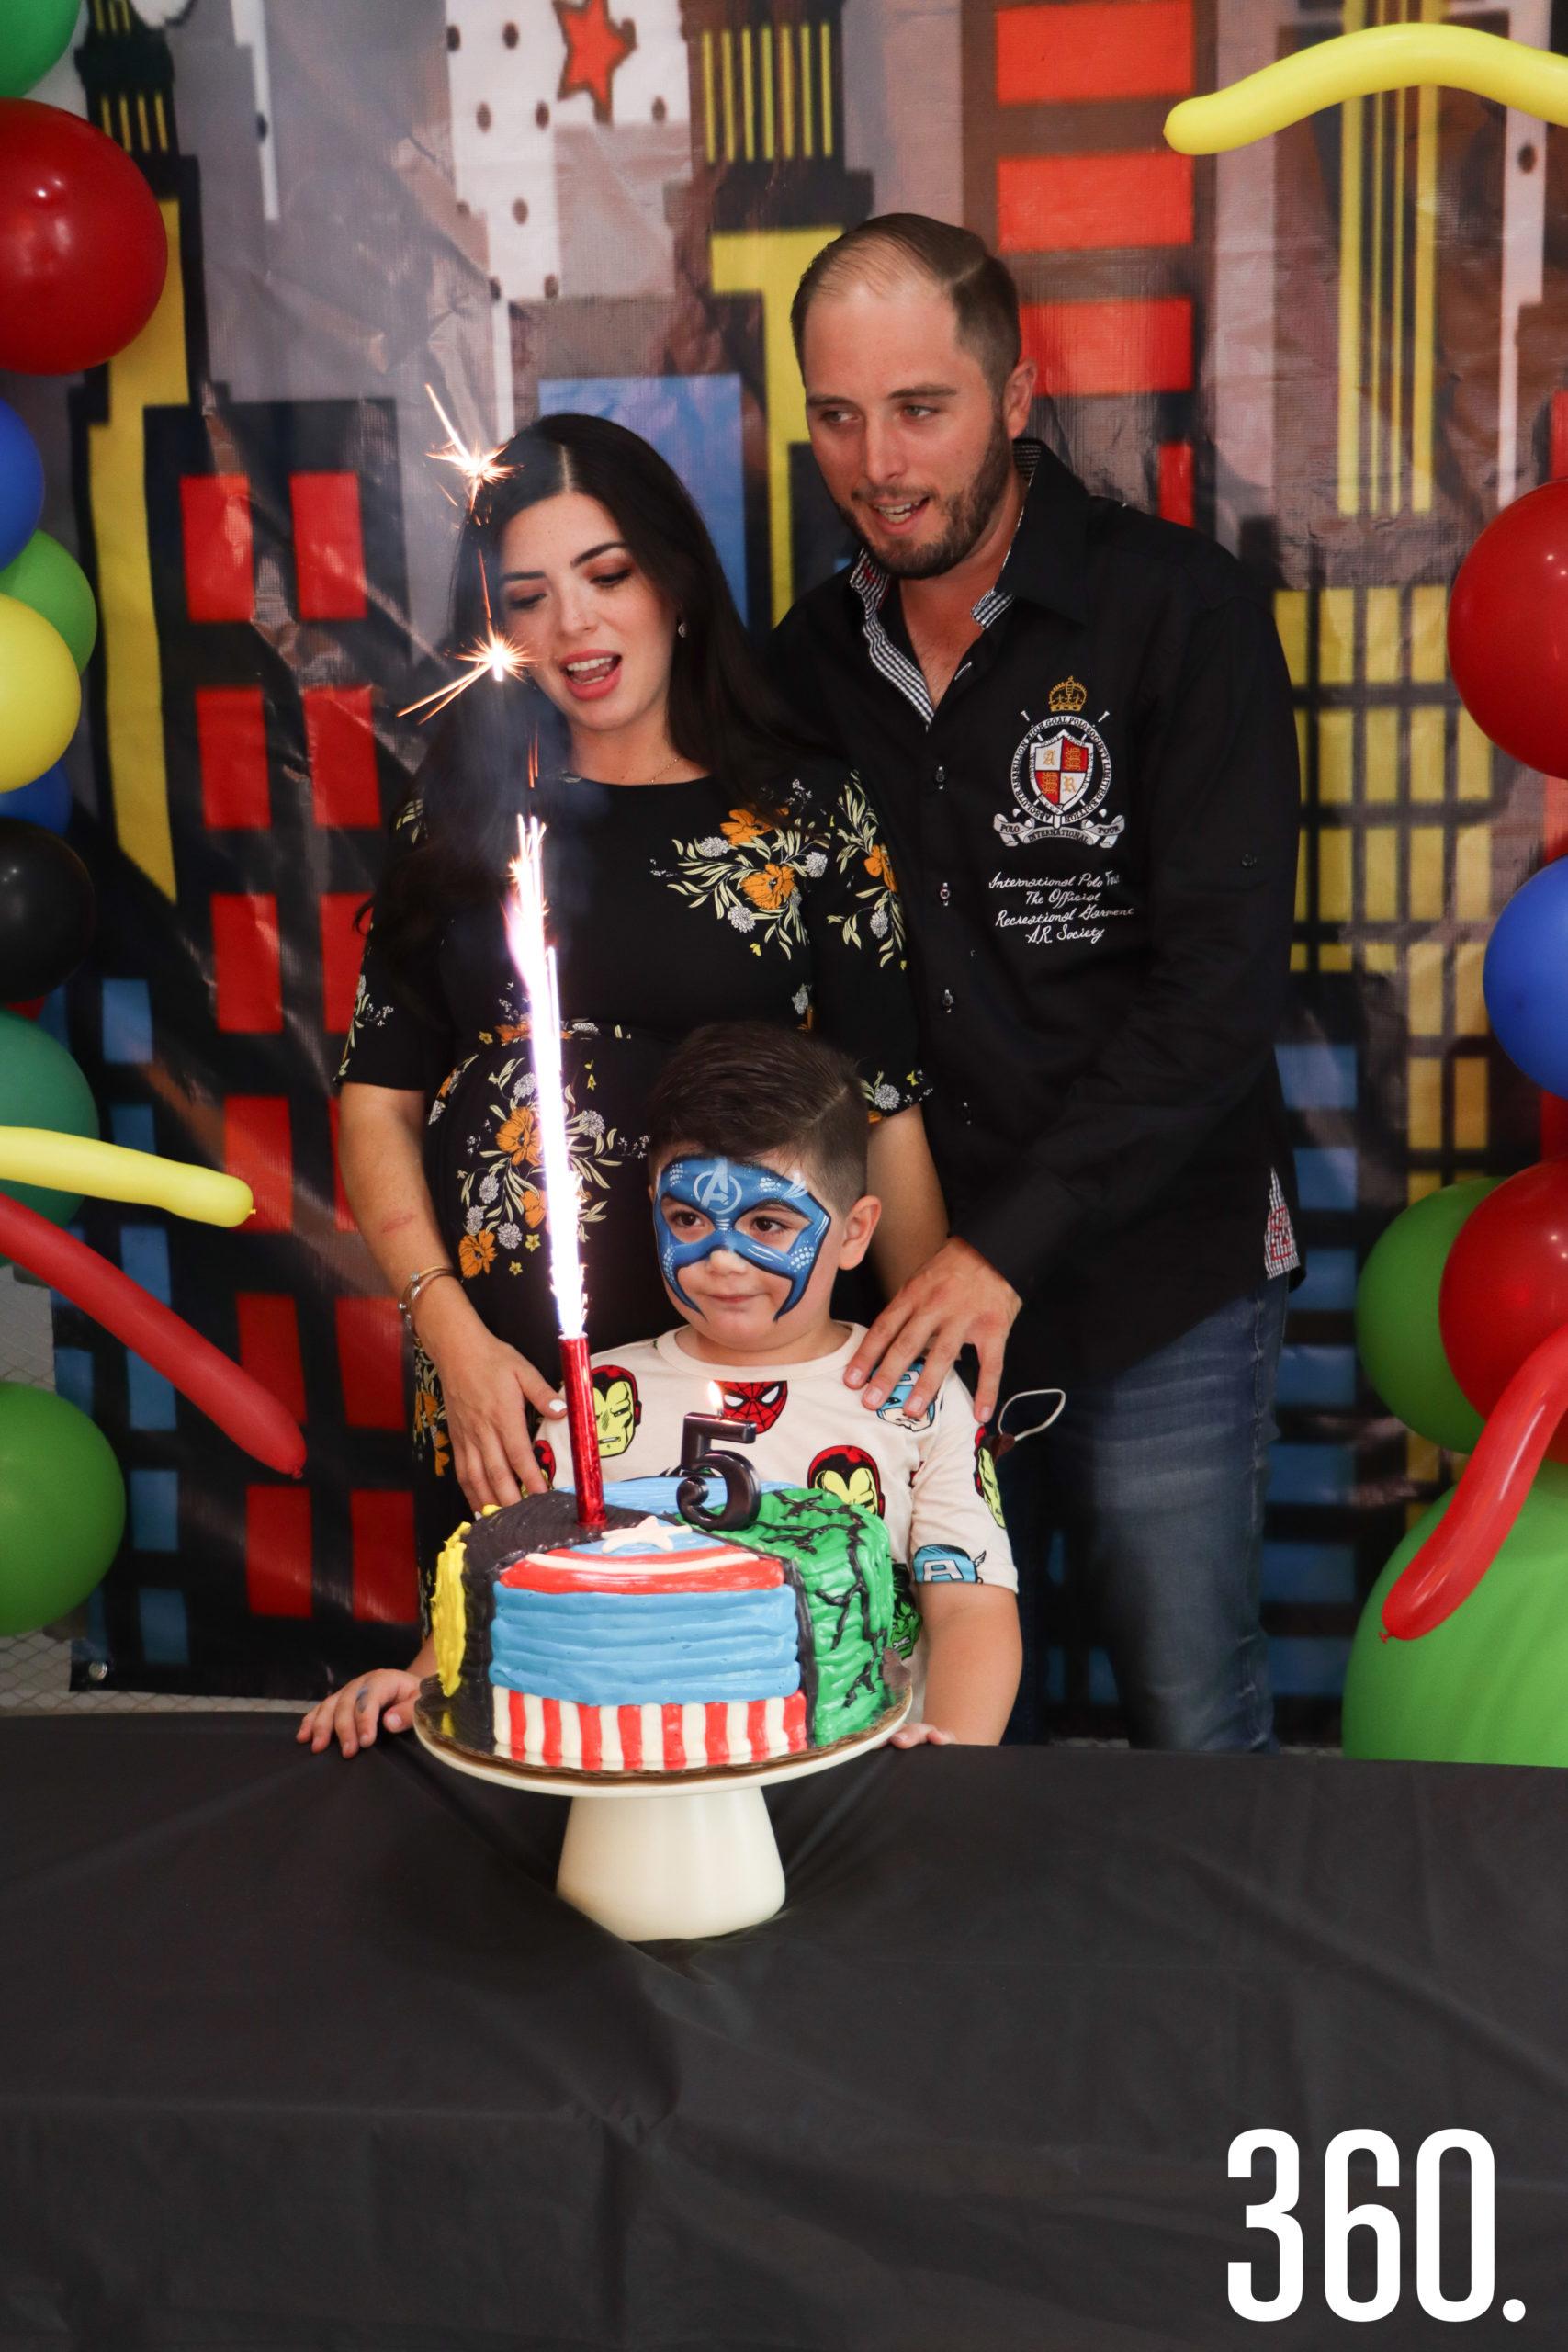 Humberto con sus padres, Olga Herrera y Humberto Villarreal.